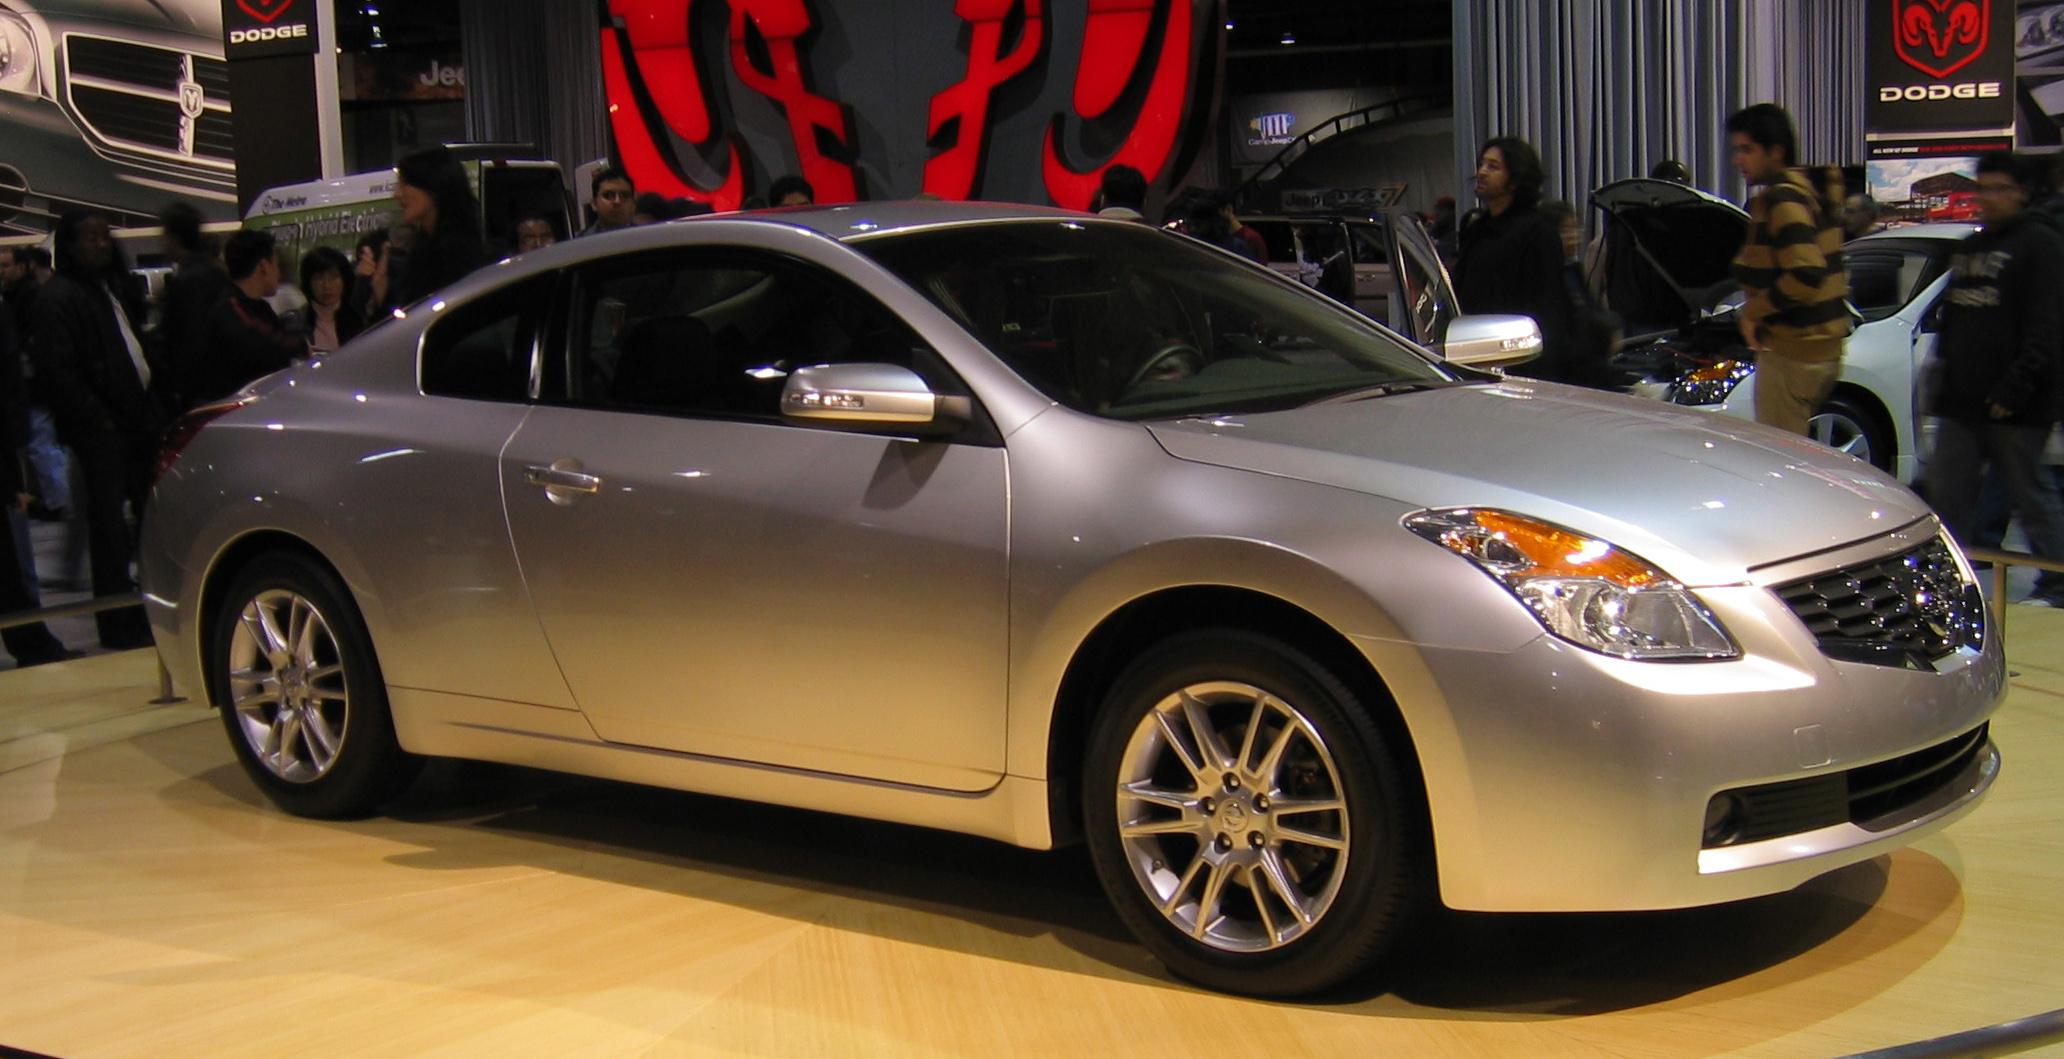 Amazing 2007 Nissan Altima Coupe 2064 X 1059 · 698 KB · Jpeg